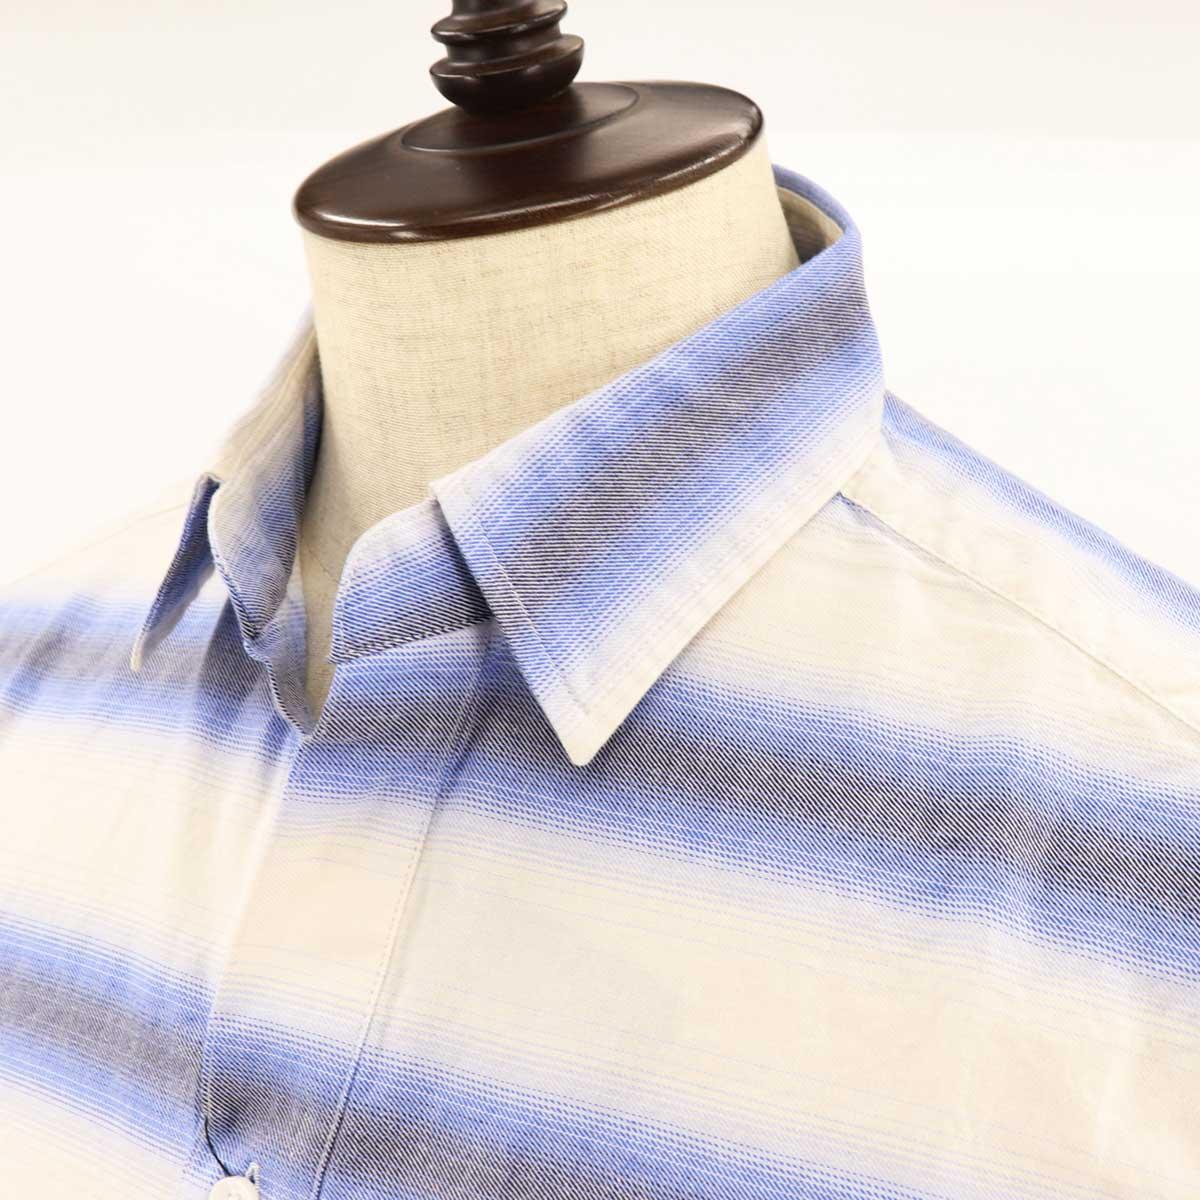 【50%OFF】オンブルボーダー レギュラーカラー カプリシャツ(BLUE)